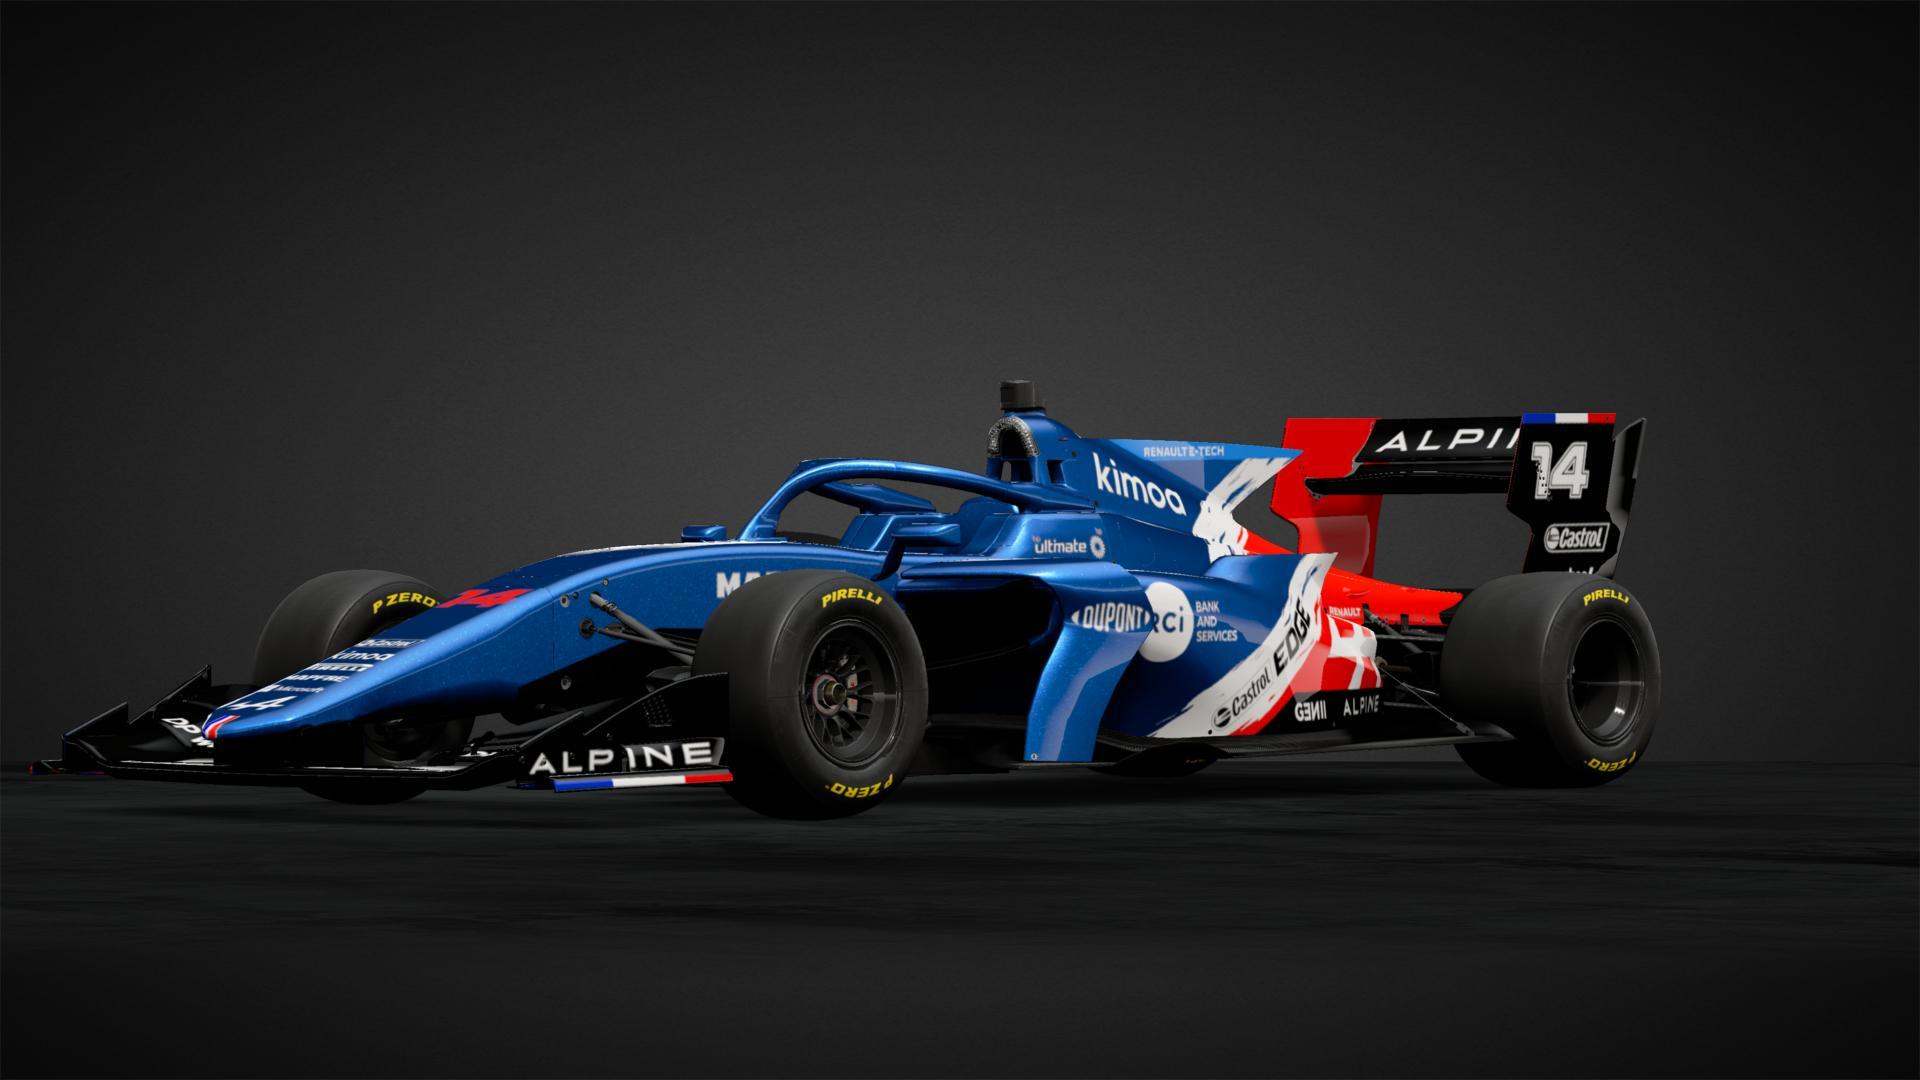 Alpine F1 2021 Concept Car Livery By Benjaguz Community Gran Turismo Sport